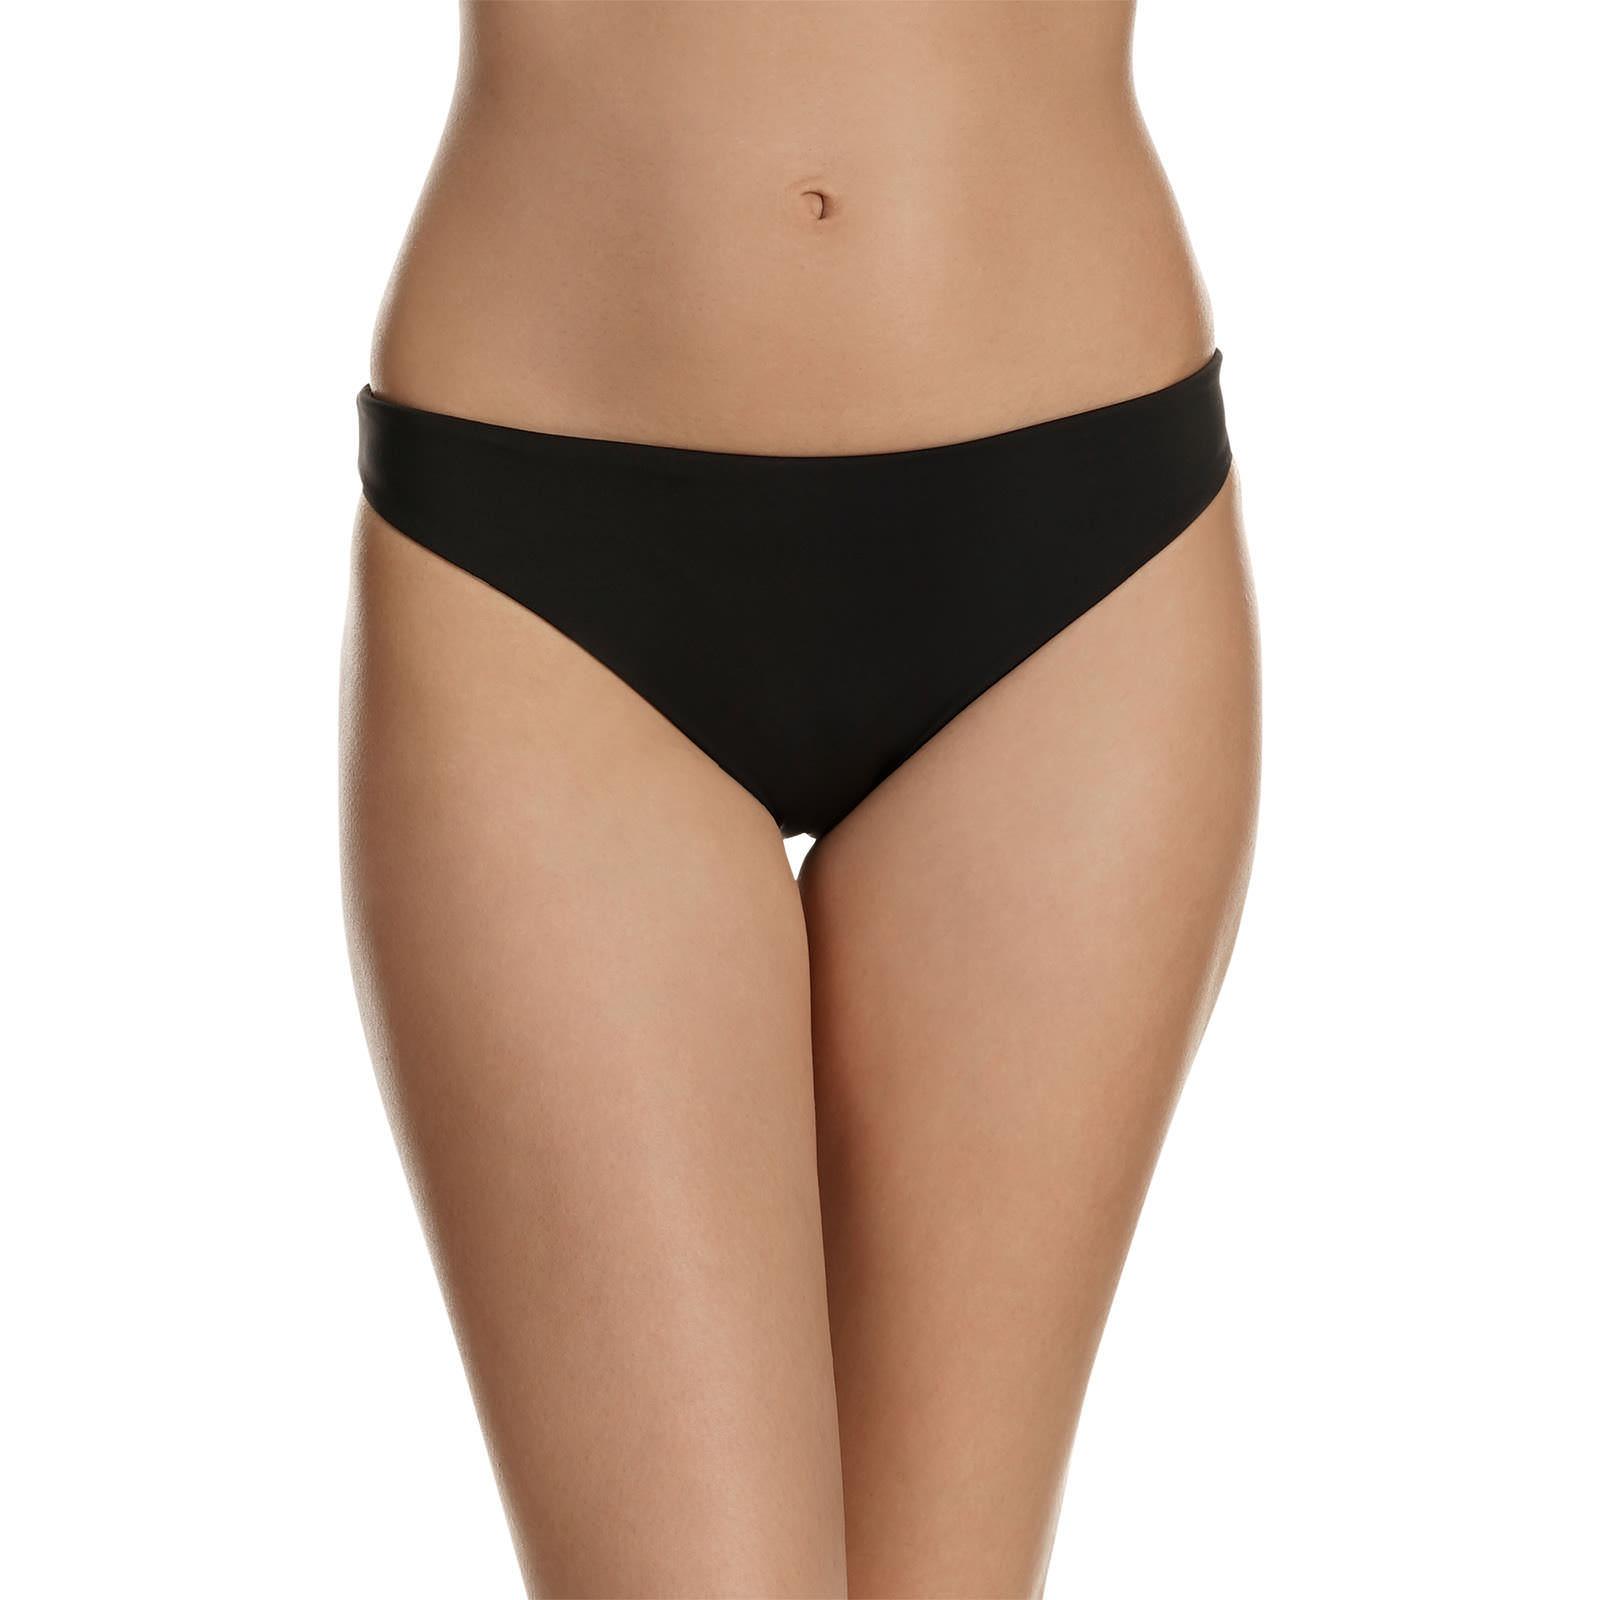 bikini unterteil madeira in schwarz bademode bikini hose slip. Black Bedroom Furniture Sets. Home Design Ideas